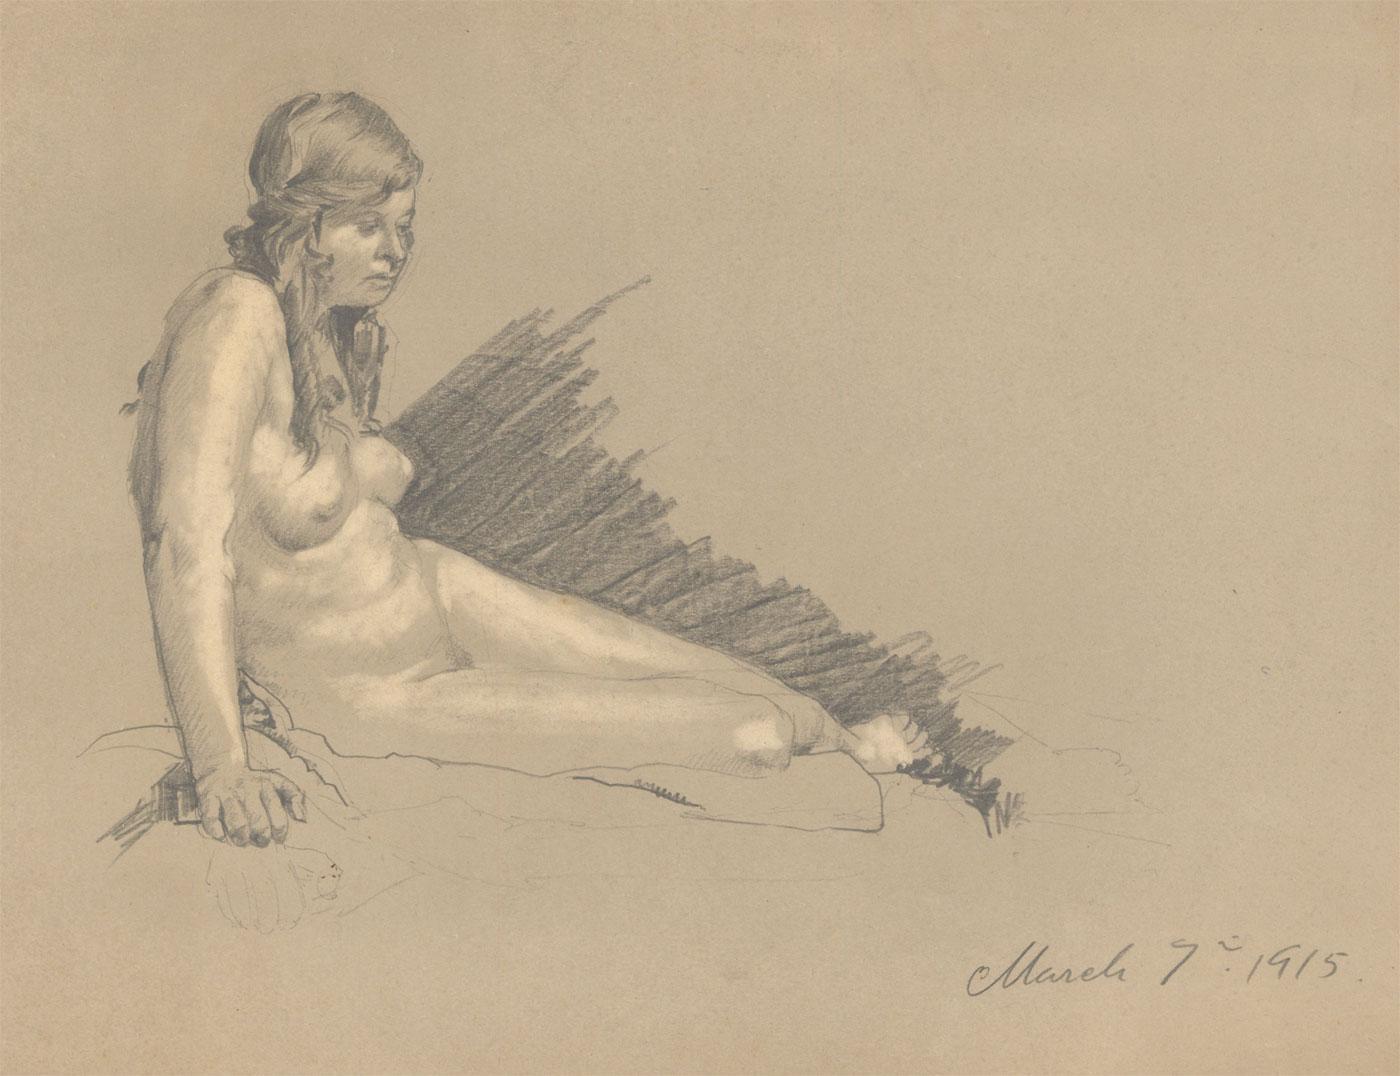 William Robert Hay - Signed 1915 Graphite Drawing, Female Nude William Robert Hay